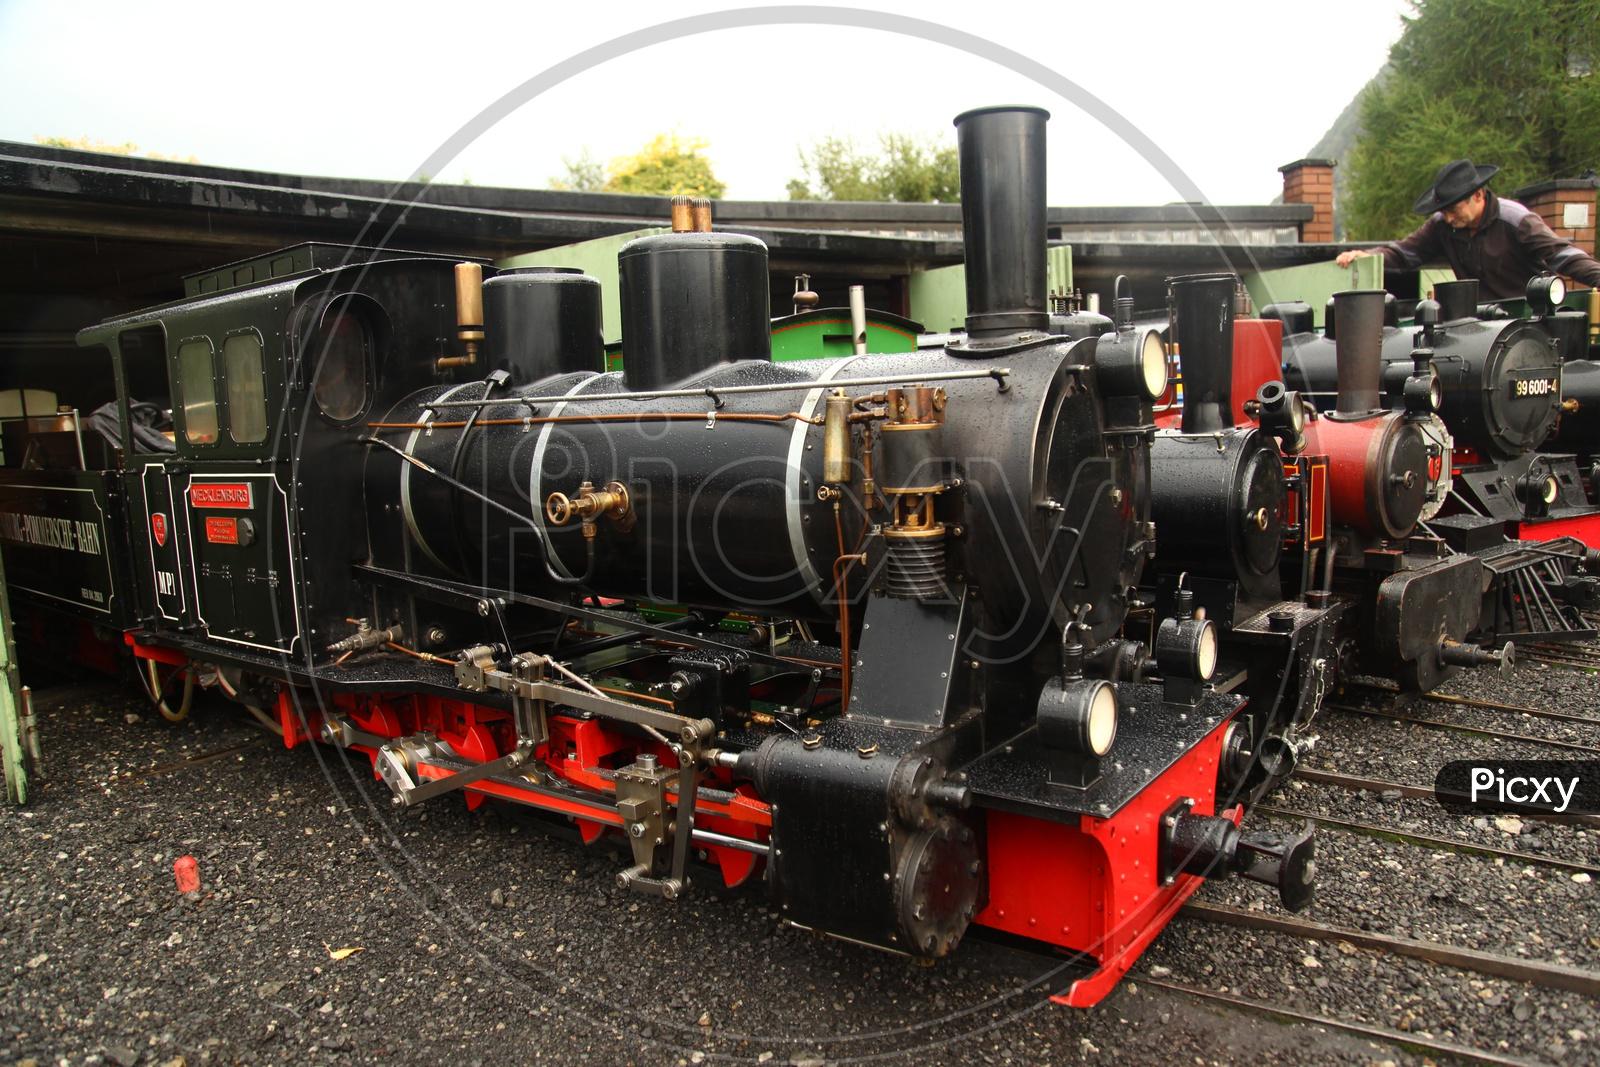 Vintage old Steam Engine Train On a Narrow Gauge Track